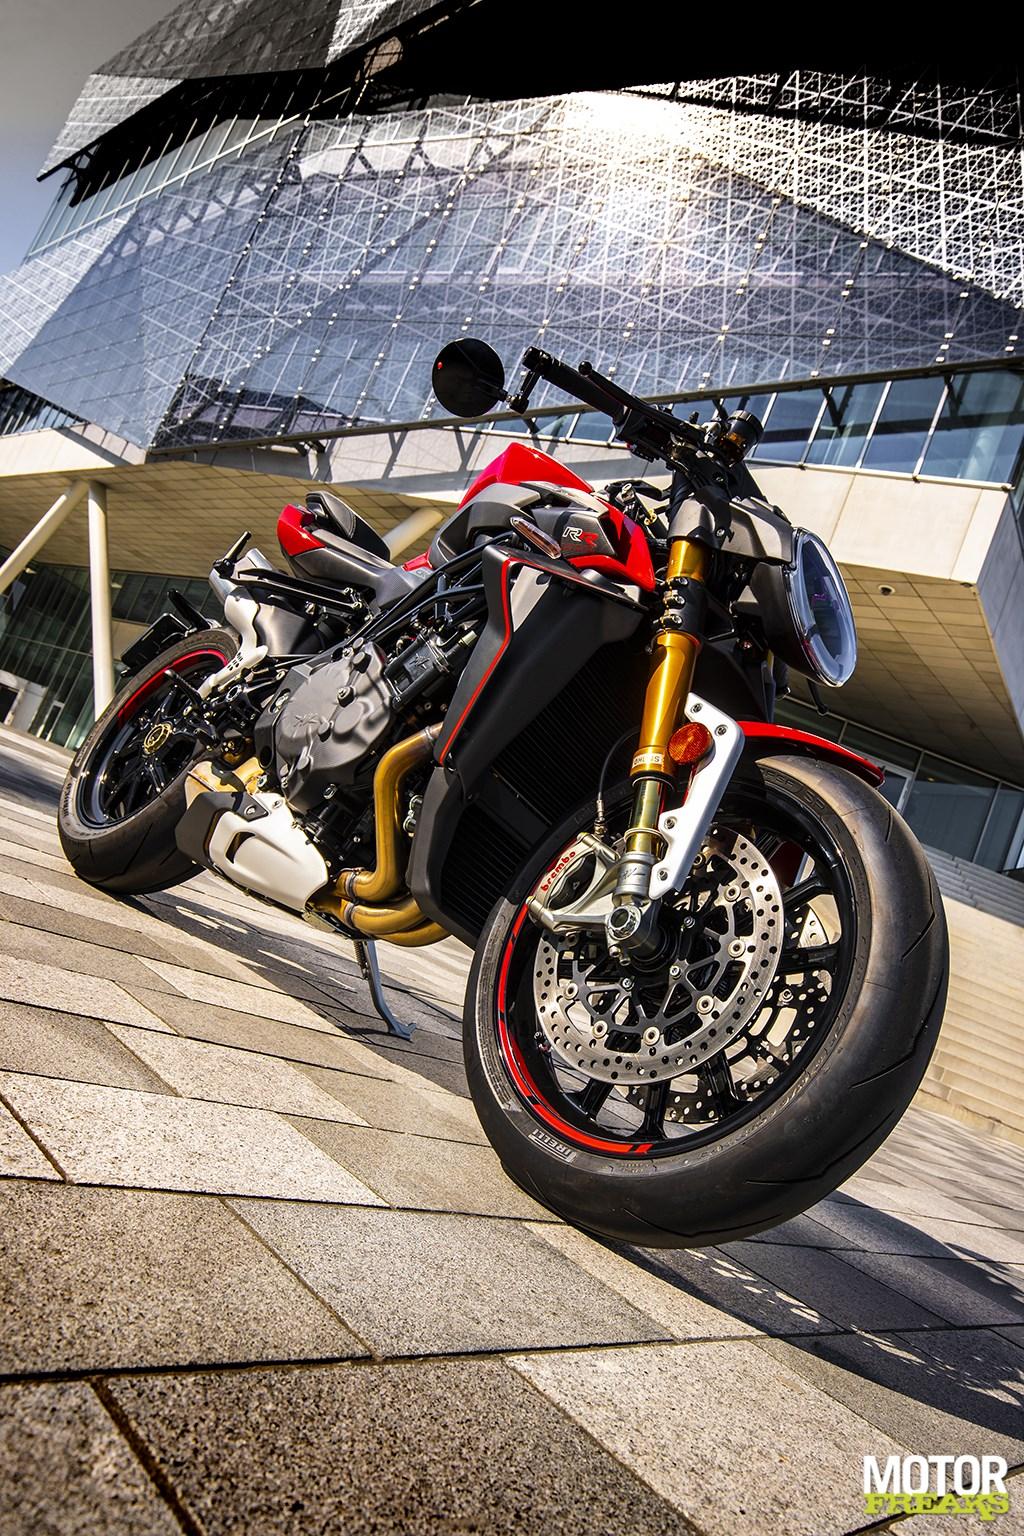 Motorfreaks - Test: MV Agusta Brutale 1000 RR - Next